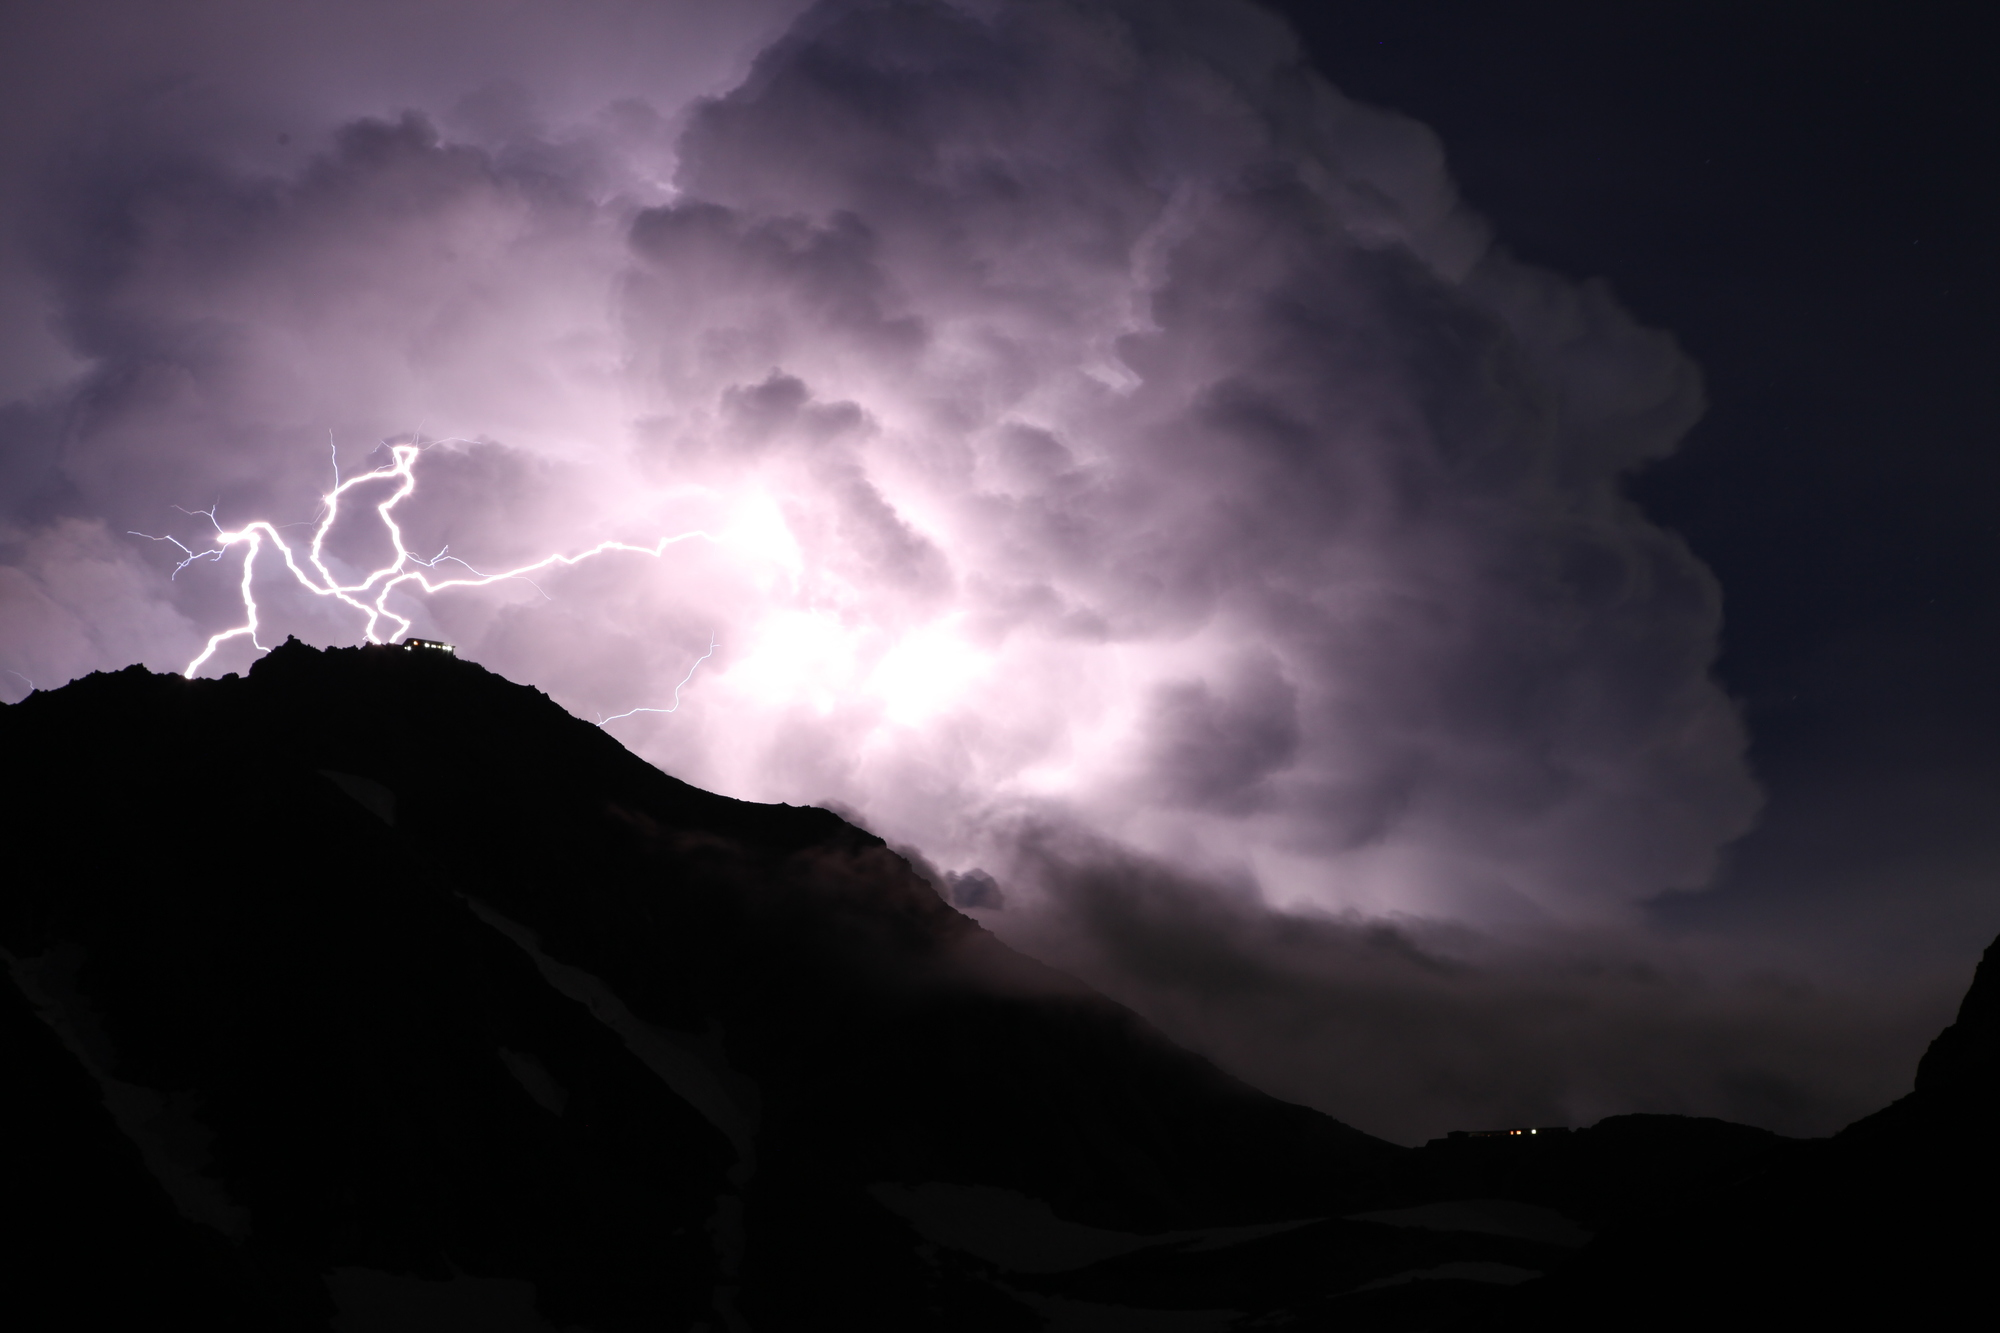 猪熊気象予報士の山の気象講座 | 兵庫県